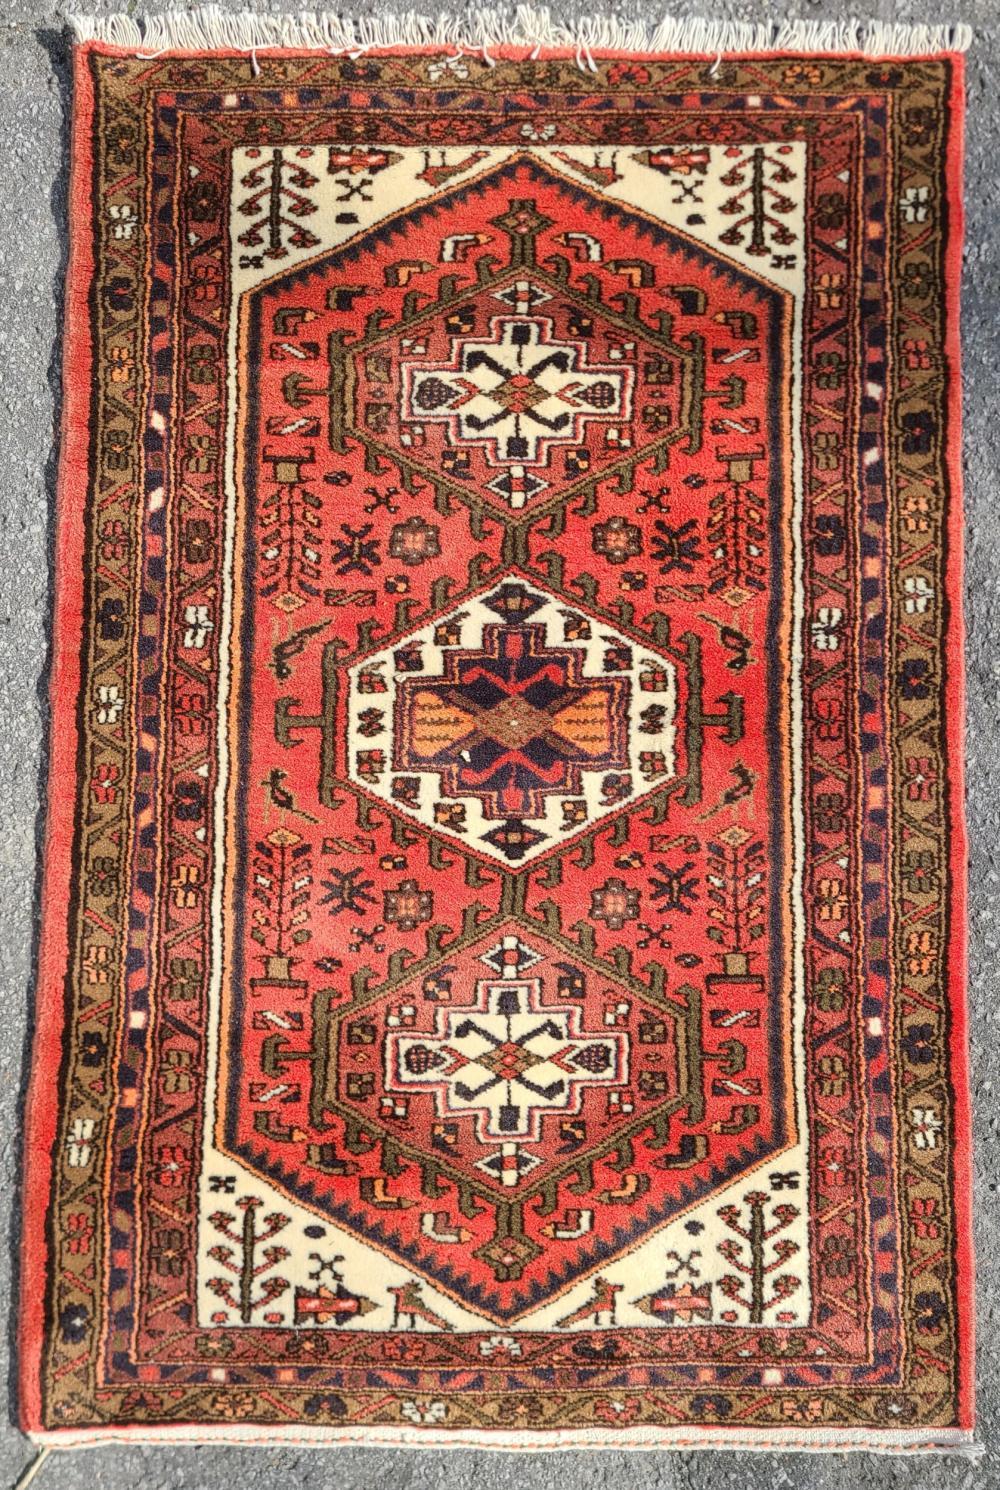 Middle Eastern Tribal Yalameh Rug